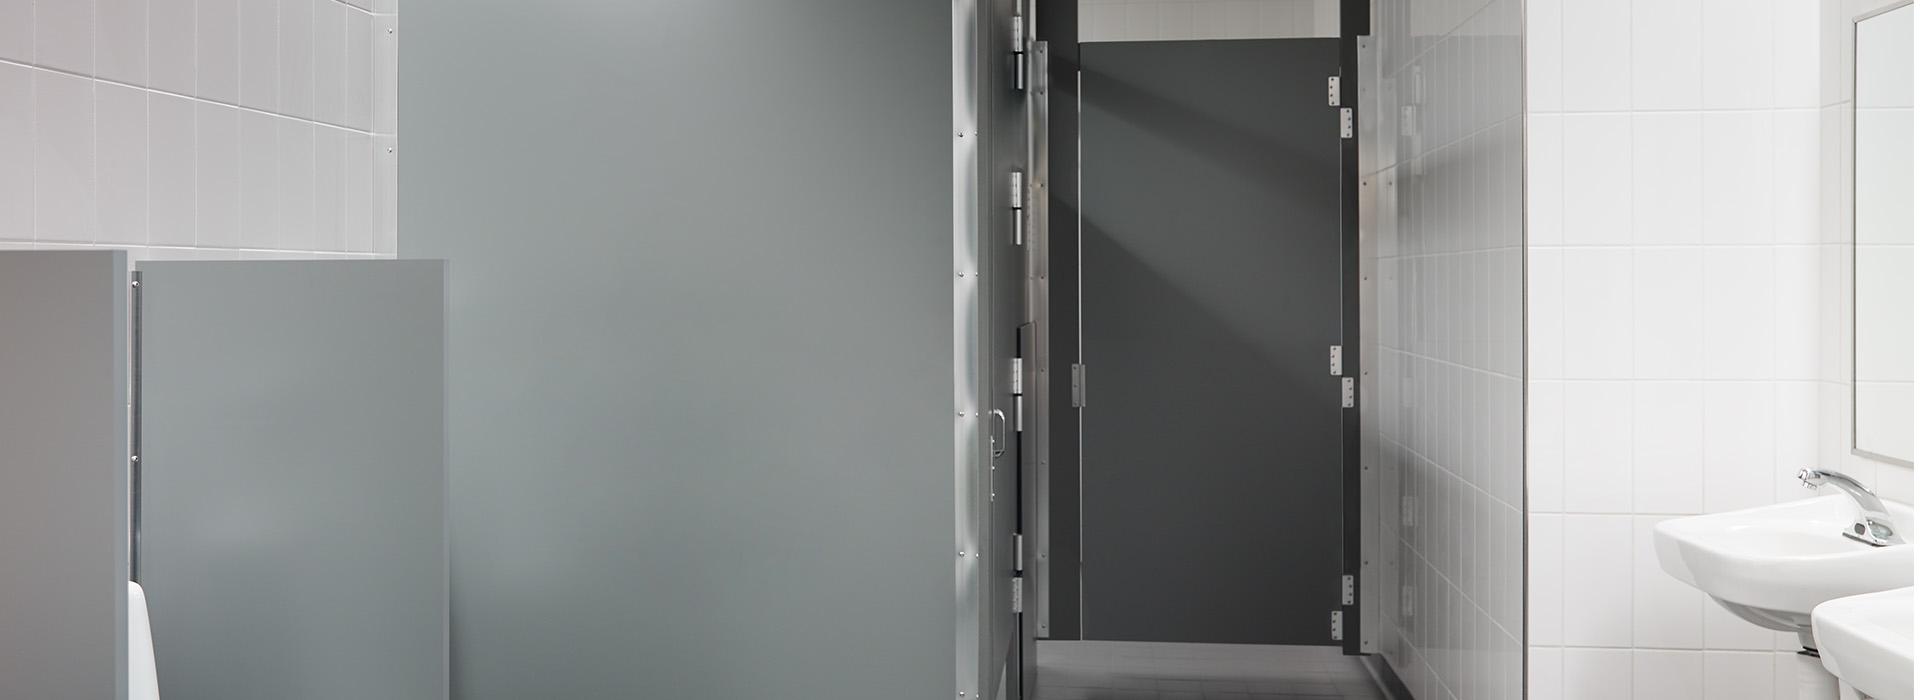 Restroom partitions 928 Mouse ColorCore2 Compact